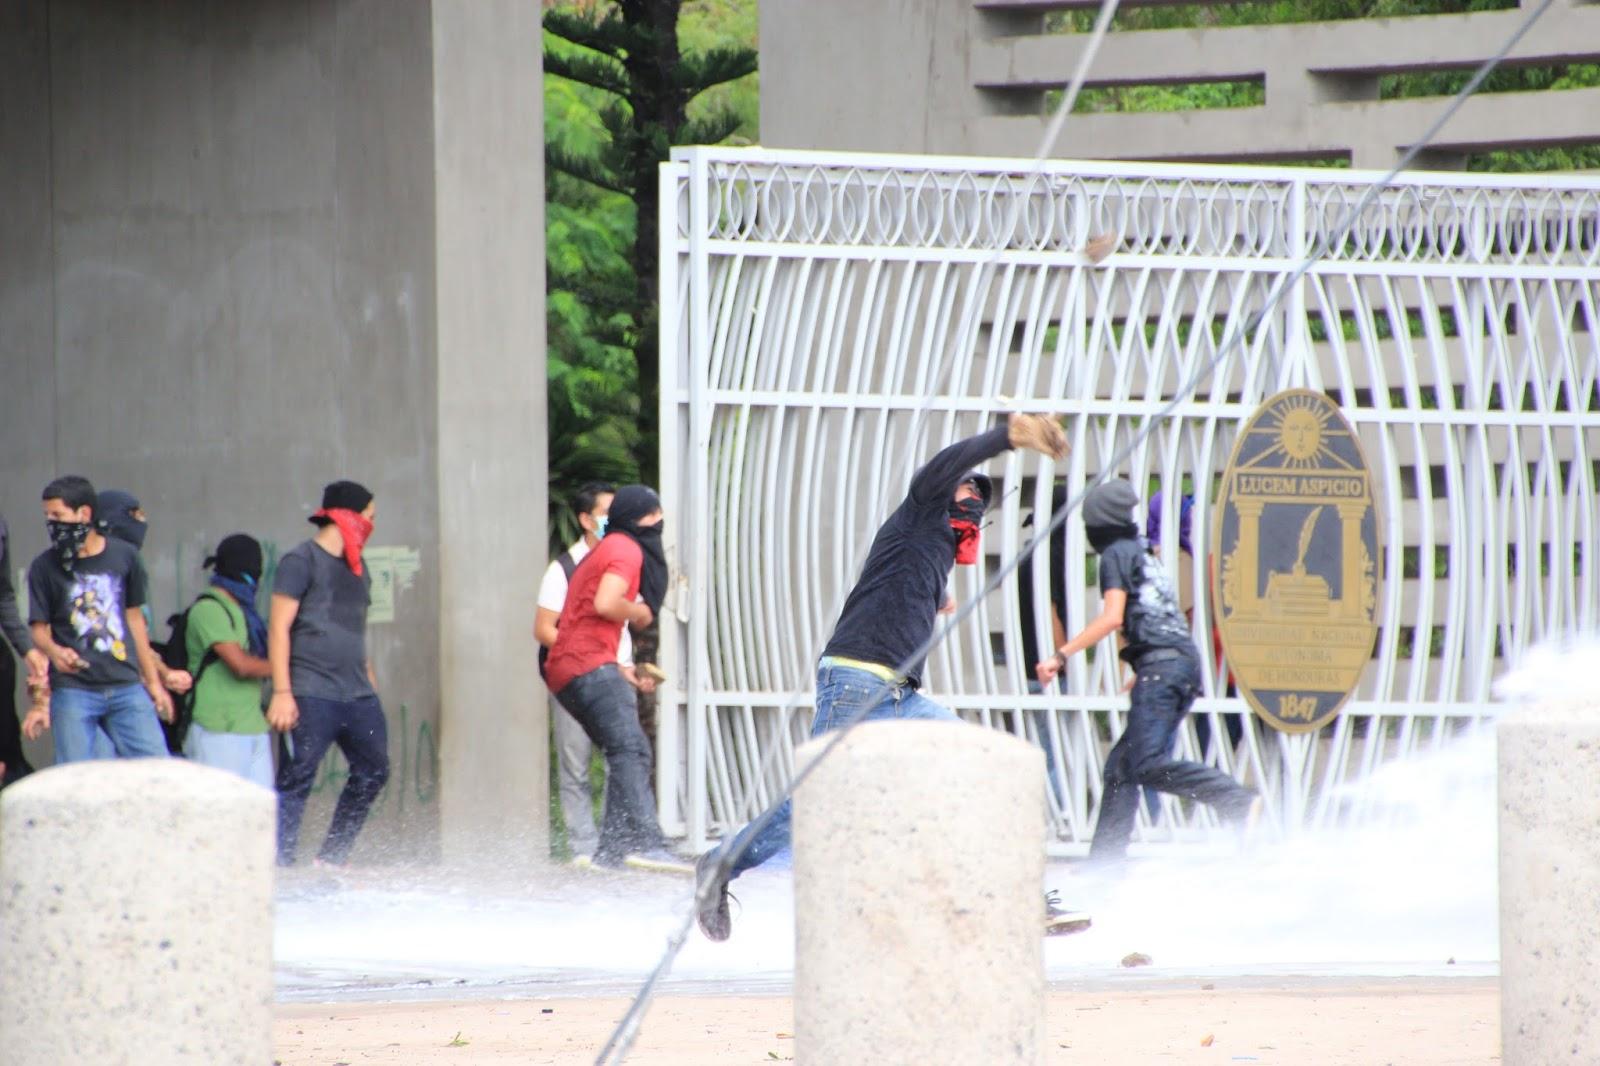 Photo caption: Students occupy the public National Autonomous University, Tegucigalpa. Photo by: Karen Spring